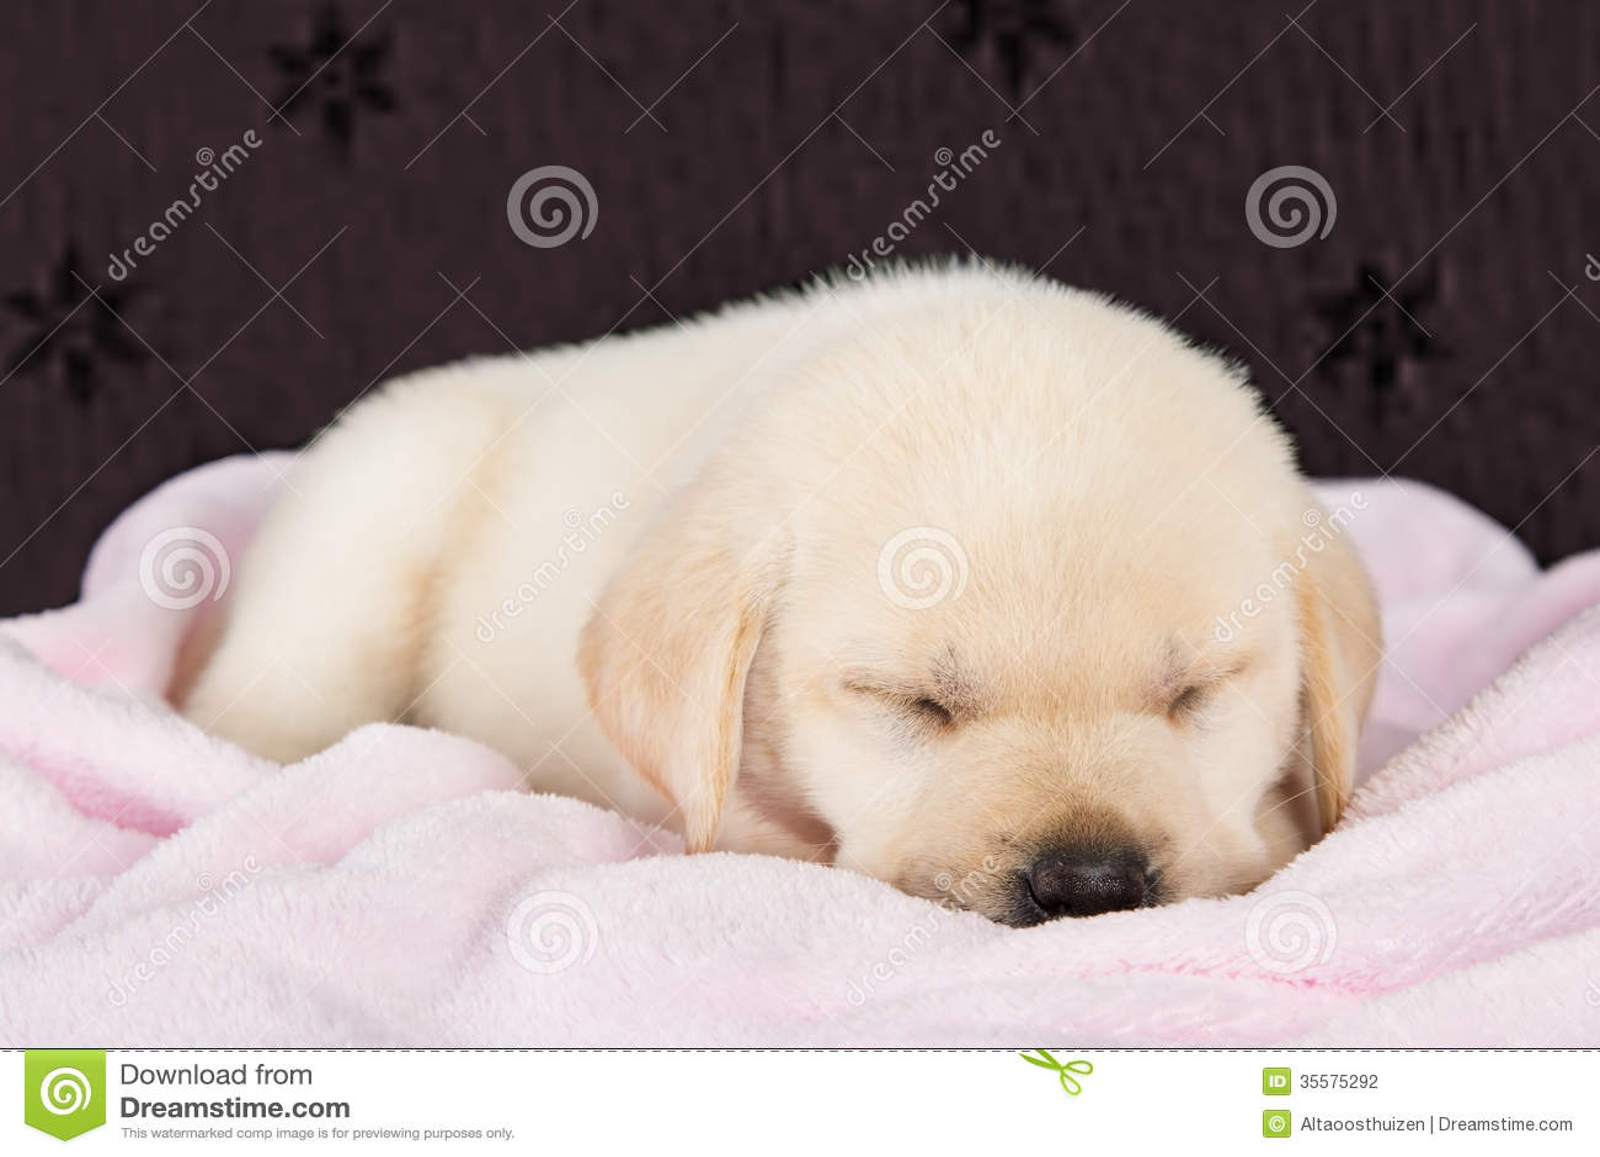 Cute Labrador Puppy Wallpaper Puppy Labrador Sleeping On Pink Fluffy Blanket Stock Photo